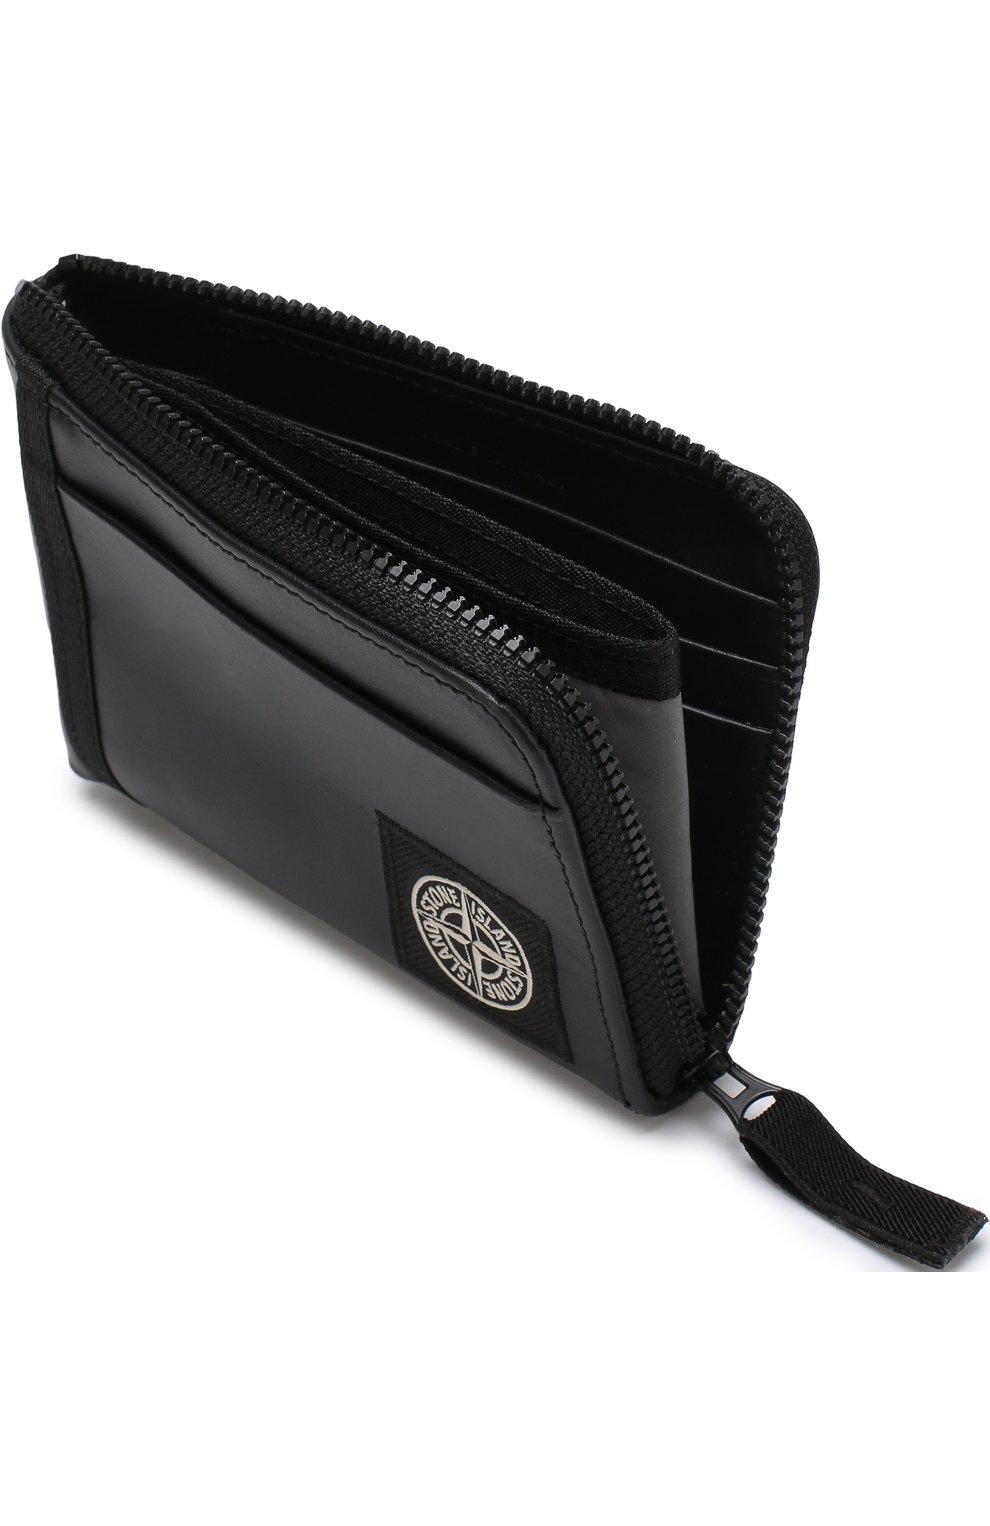 5f8799f9fd93 Кожаное портмоне на молнии с отделениями для кредитных карт Stone Island  черного цвета | Фото №